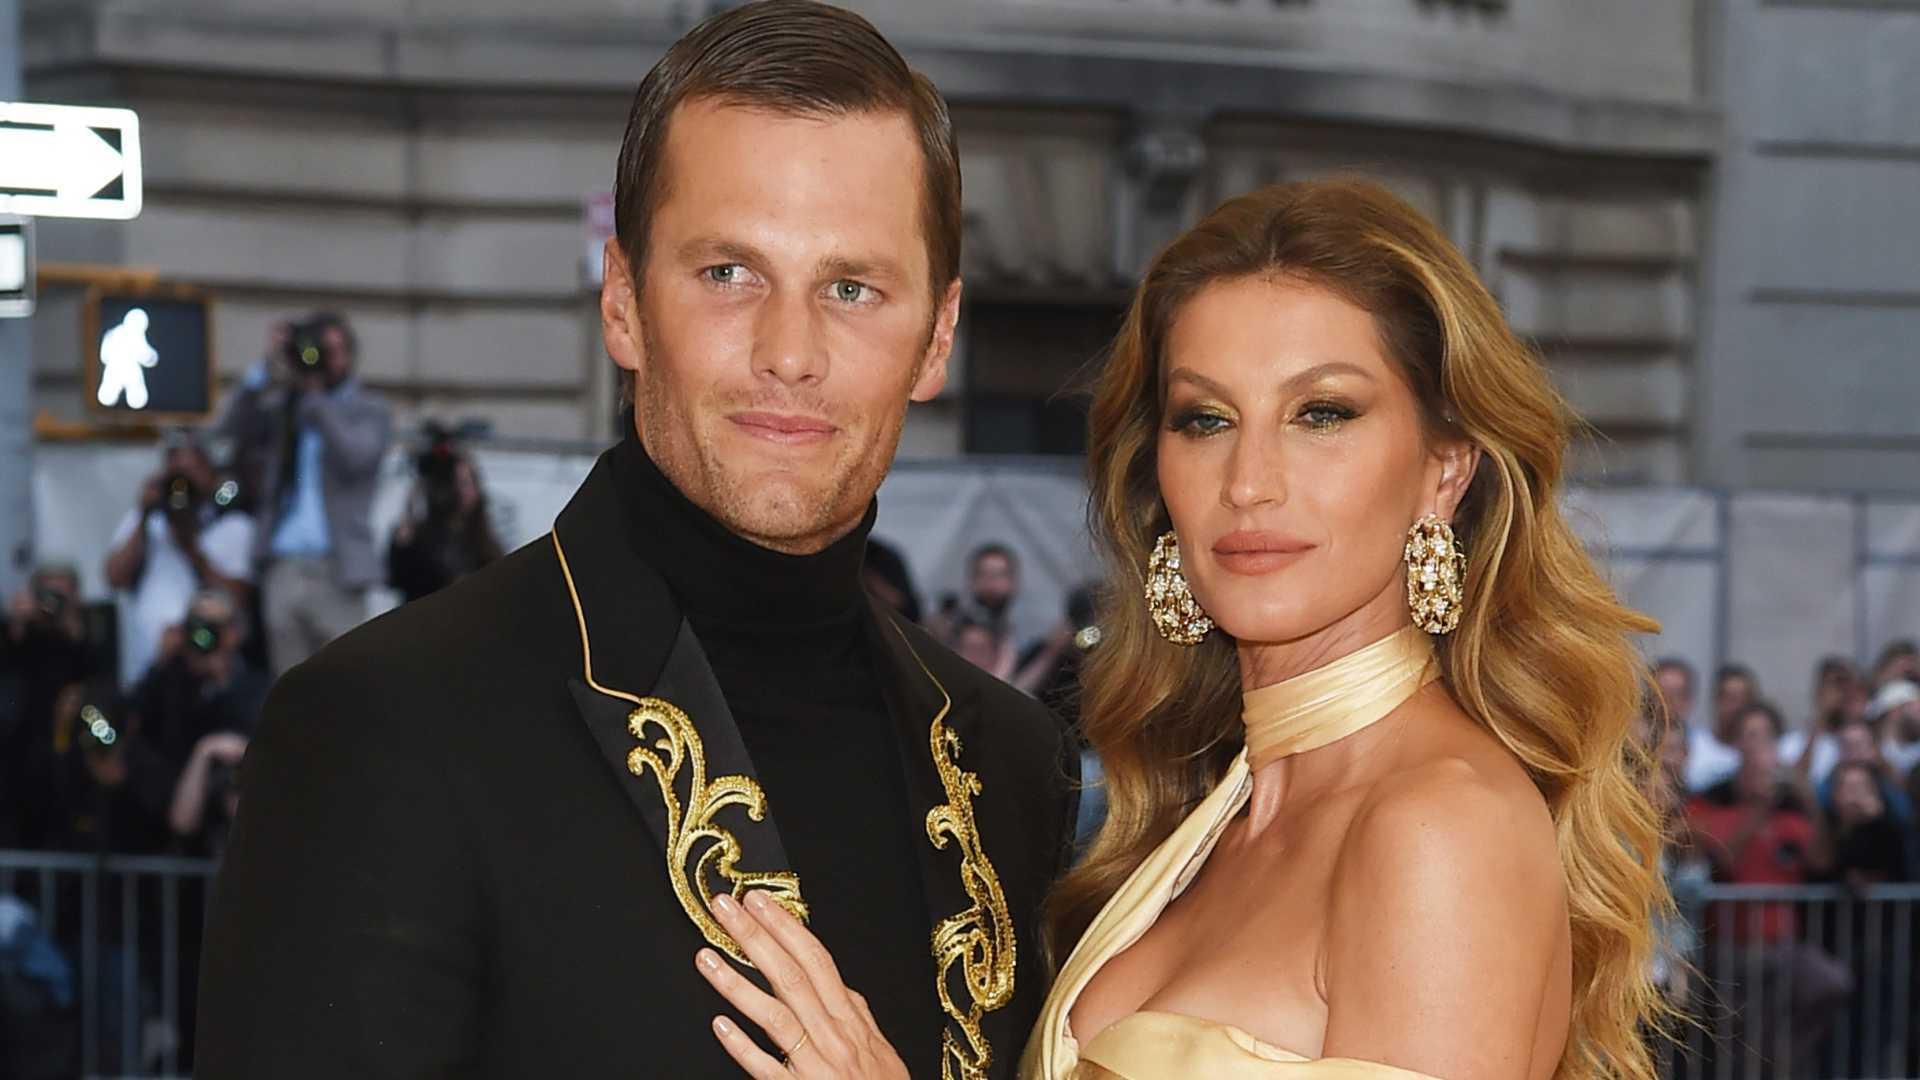 É este o 'defeito' de Tom Brady, segundo Gisele Bündchen